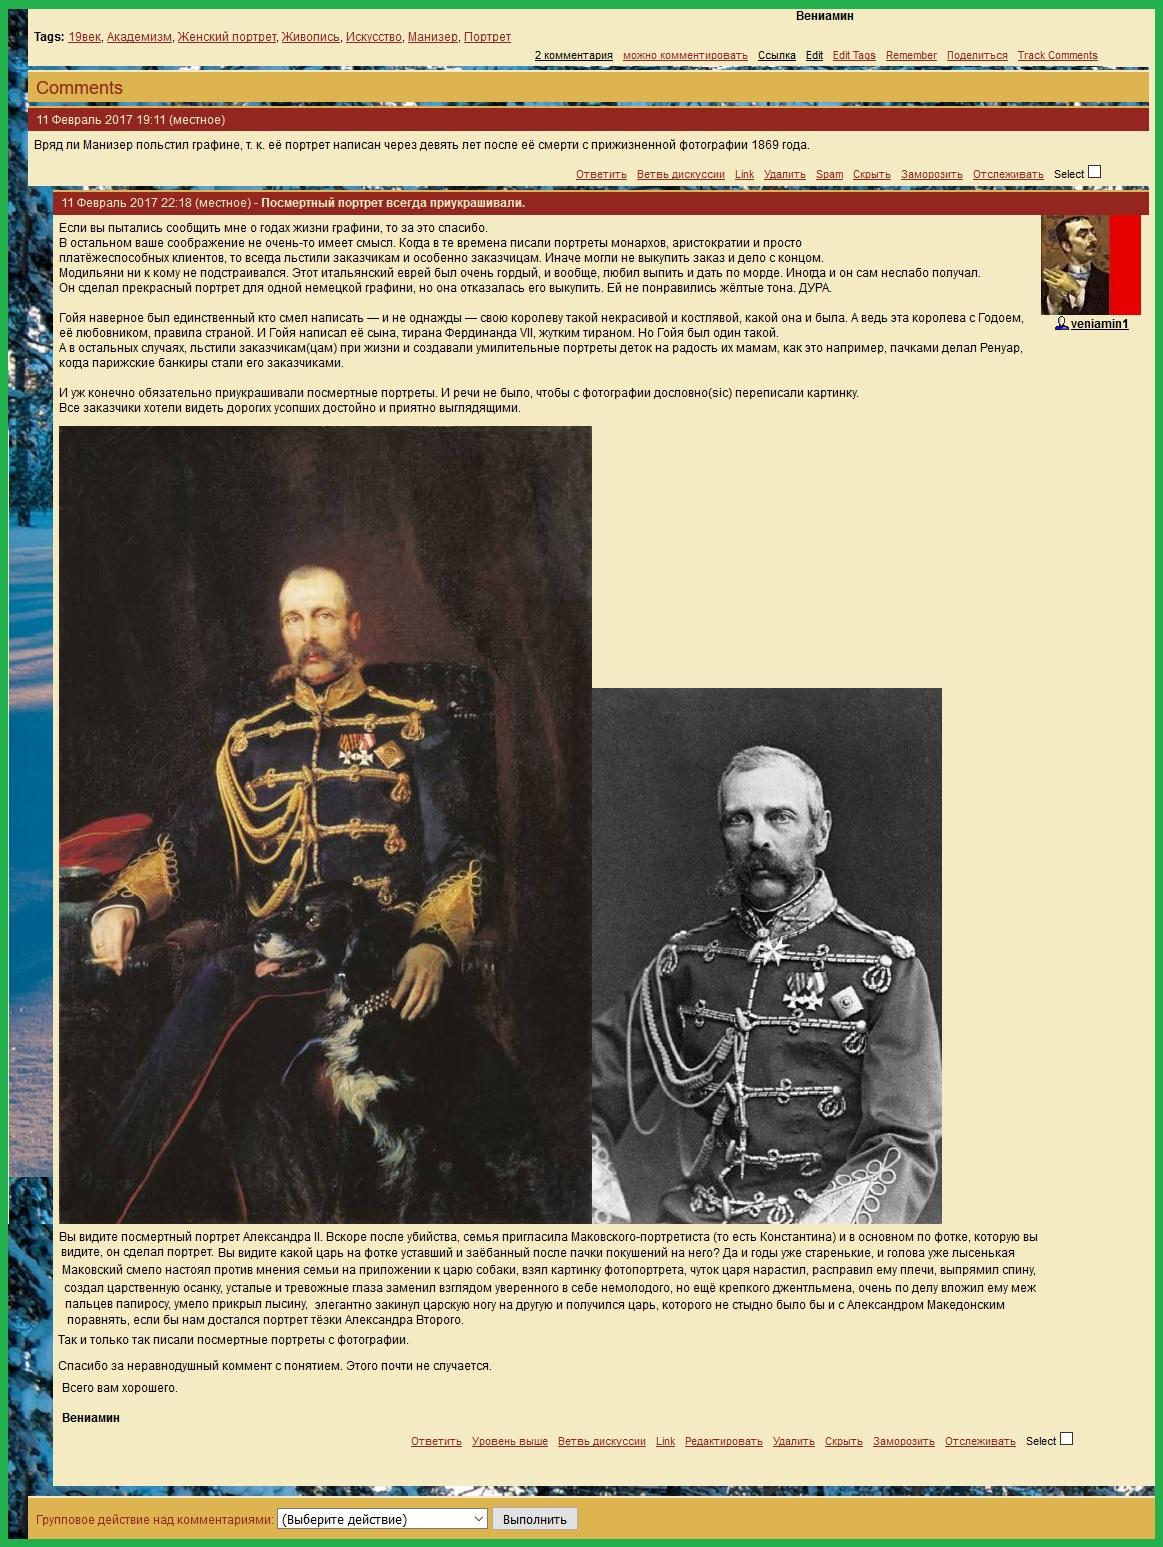 Манизер, Генрих Матвеевич (1847-1925) комменты